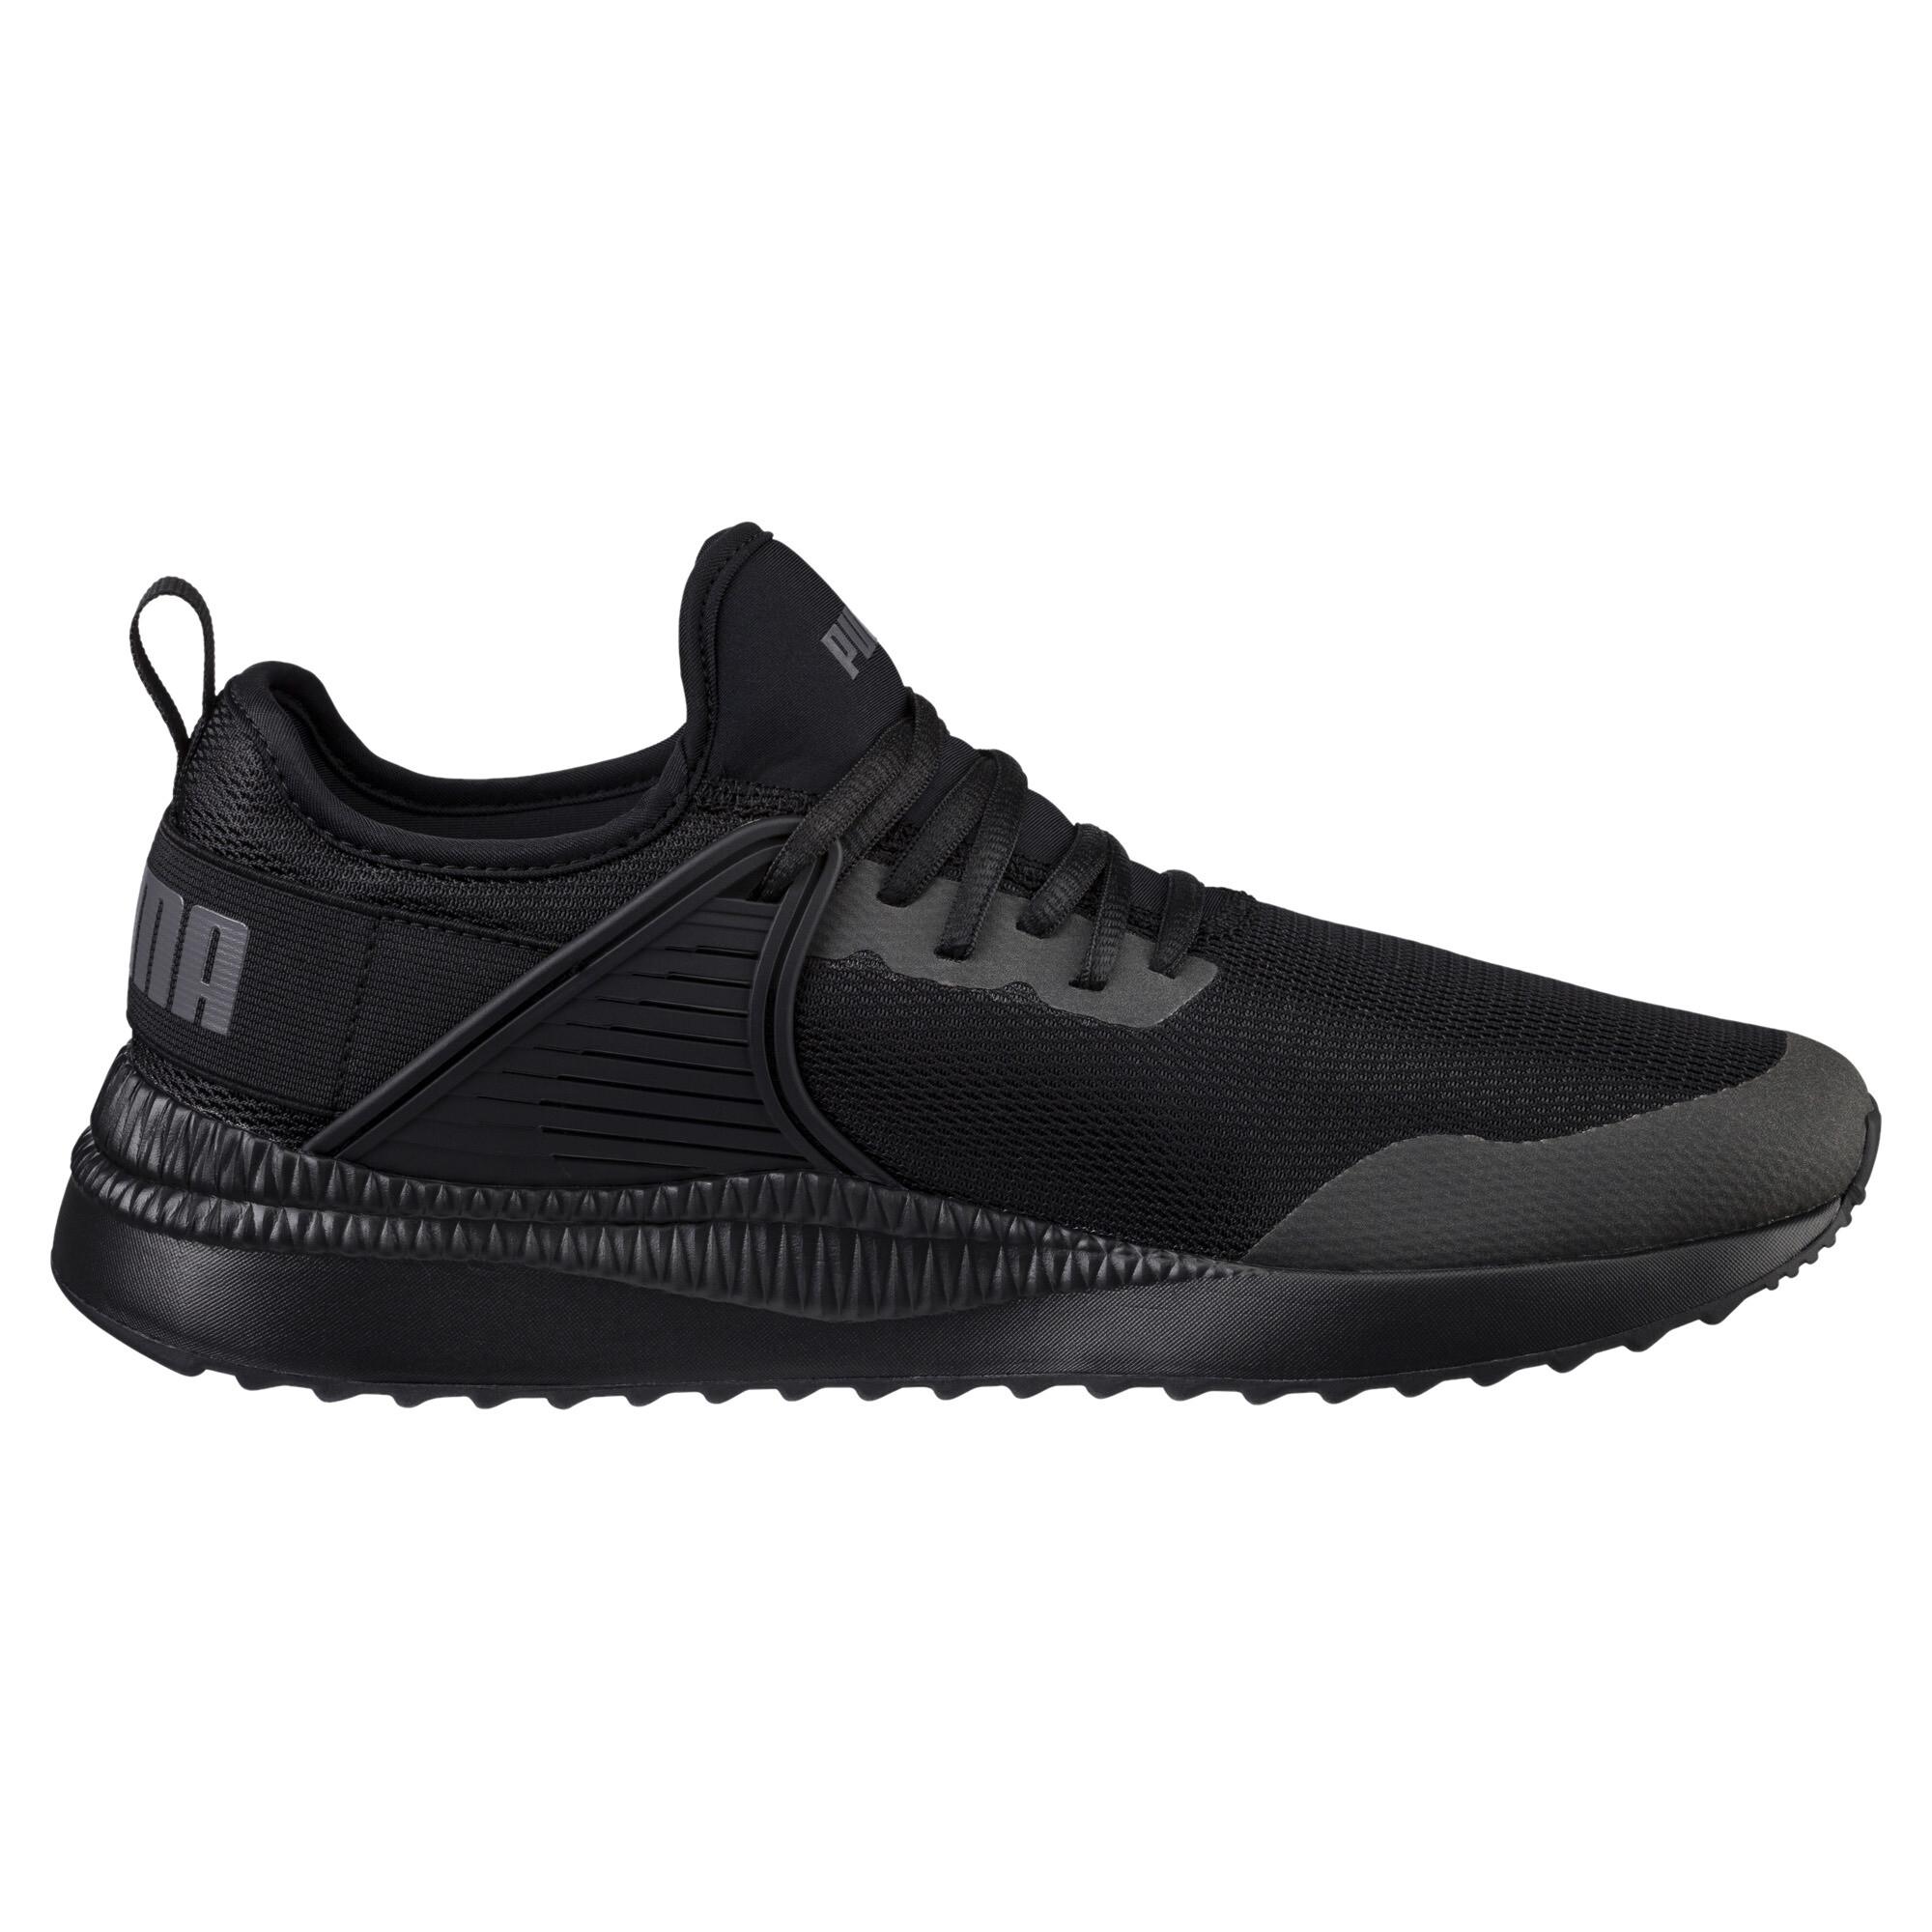 PUMA-Pacer-Next-Cage-Sneakers-Men-Shoe-Basics thumbnail 5